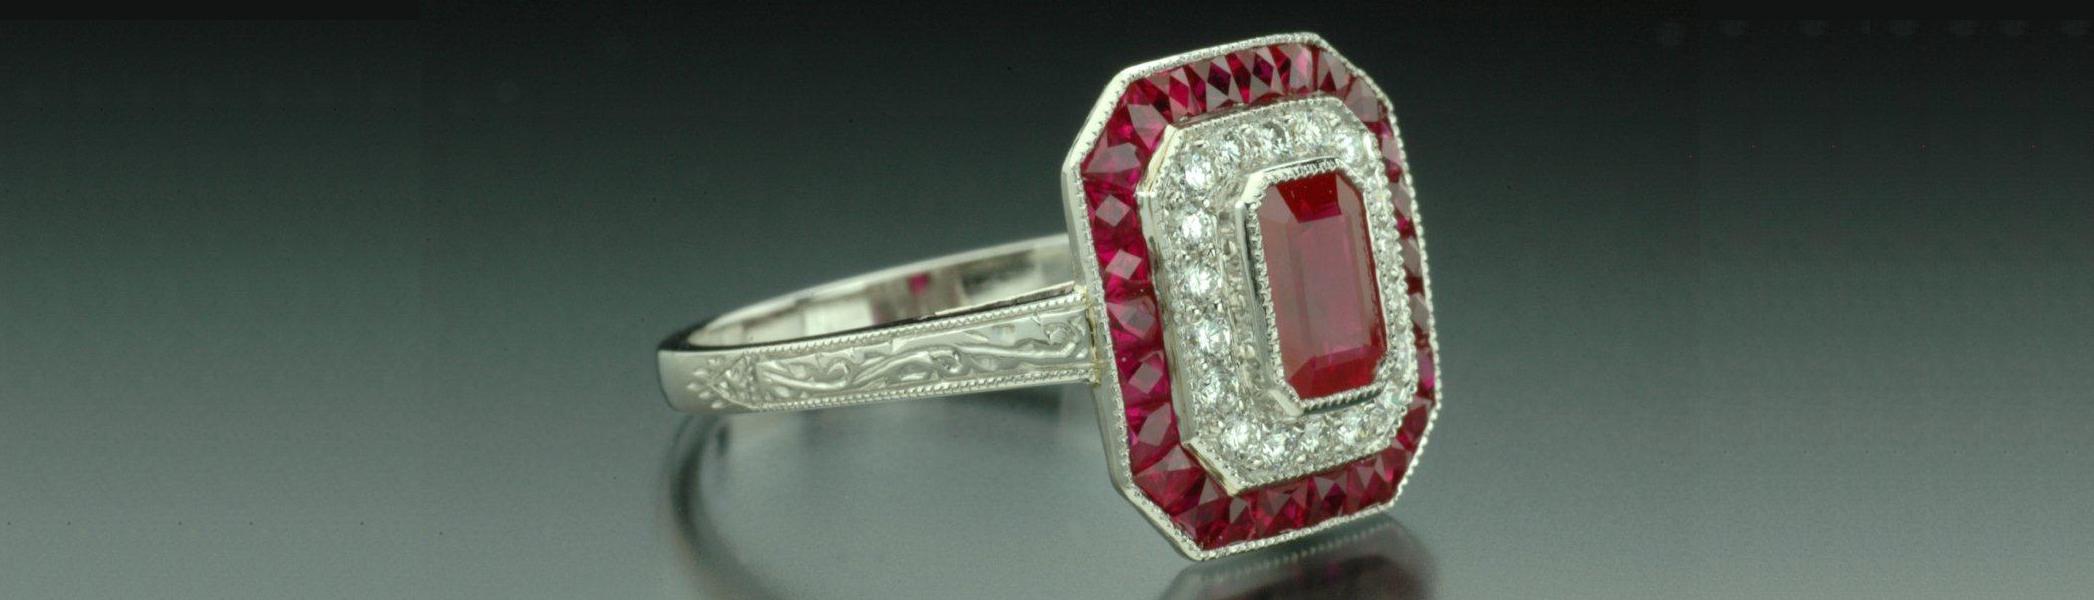 12b4079fb Homepage - Columbus Diamond Engagement Ring Jewelery - Dublin Ohio Premier Diamond  Engagement Ring Jewelry